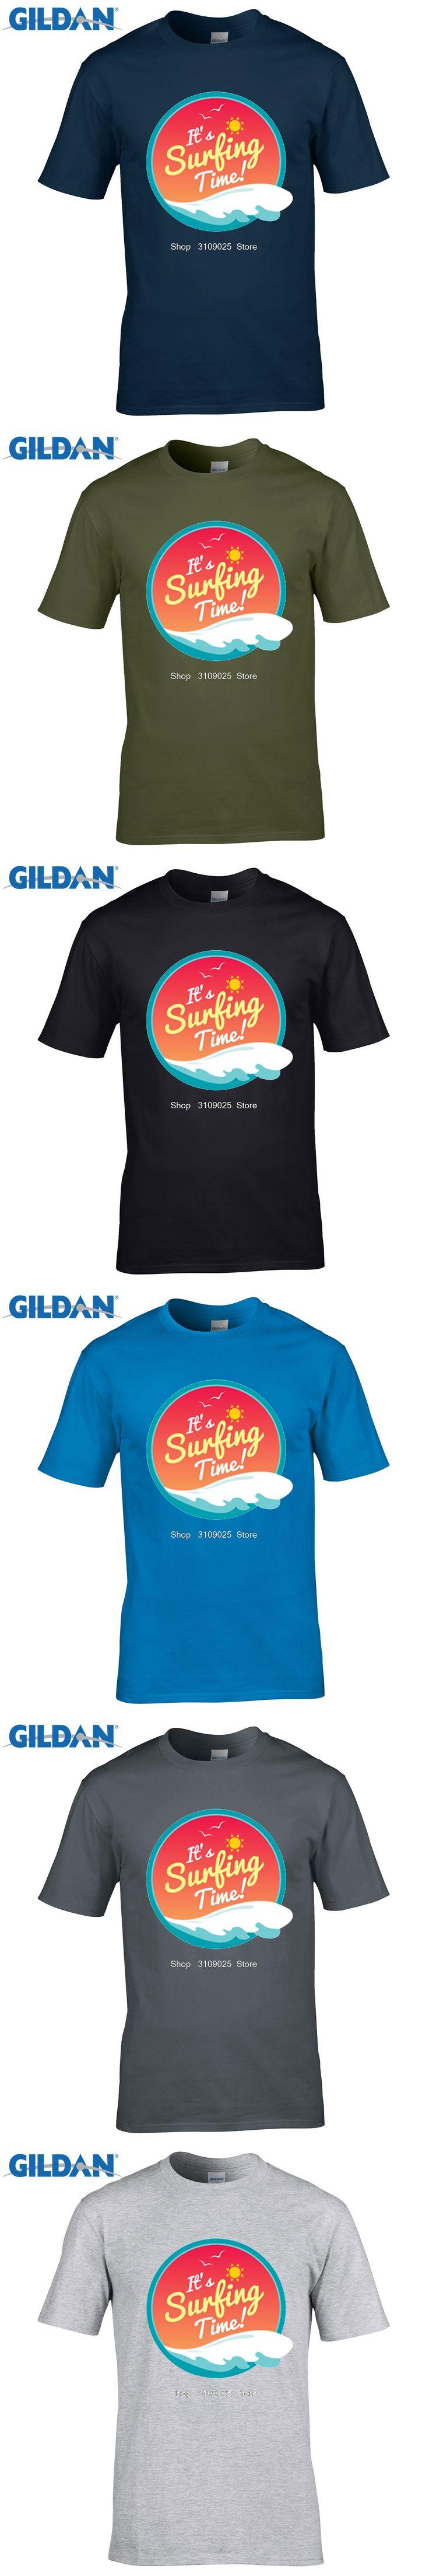 GILDAN customised t-shirts Summer Holiday Men's Short Sleeve Clothes Sunshine  Tree T-shirts Surffing Trooper T Shirts